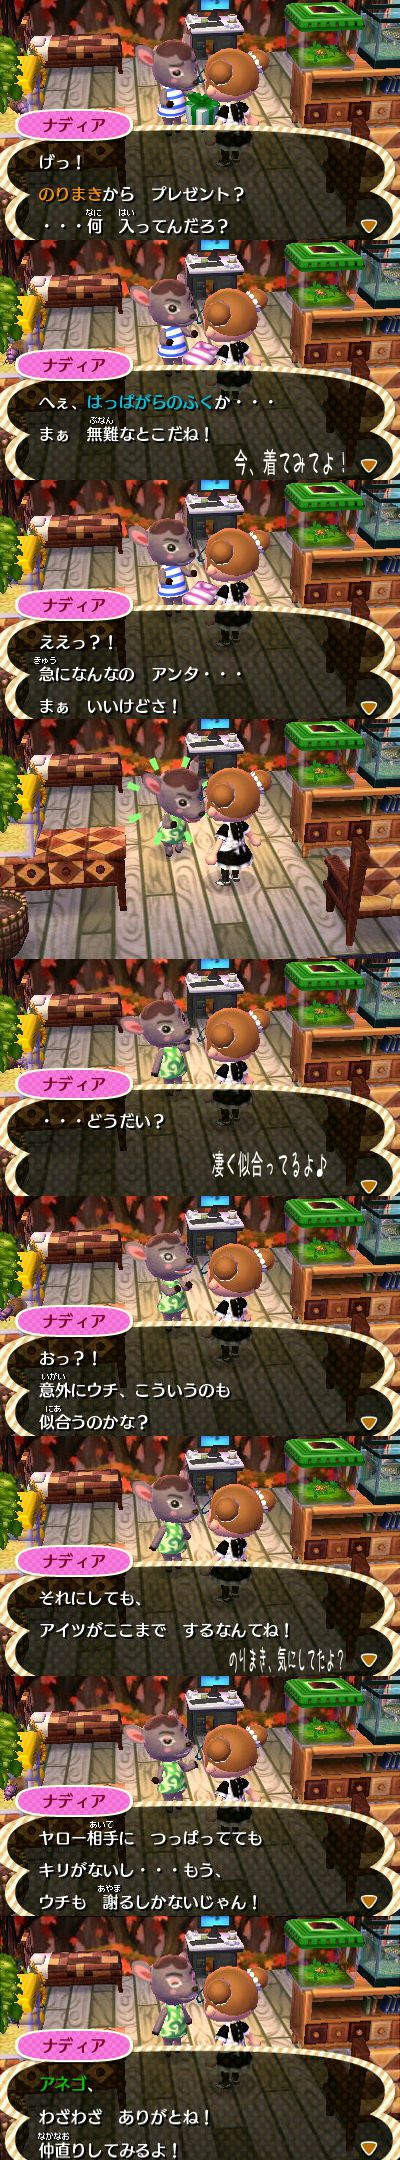 nade_nakanaori.jpg